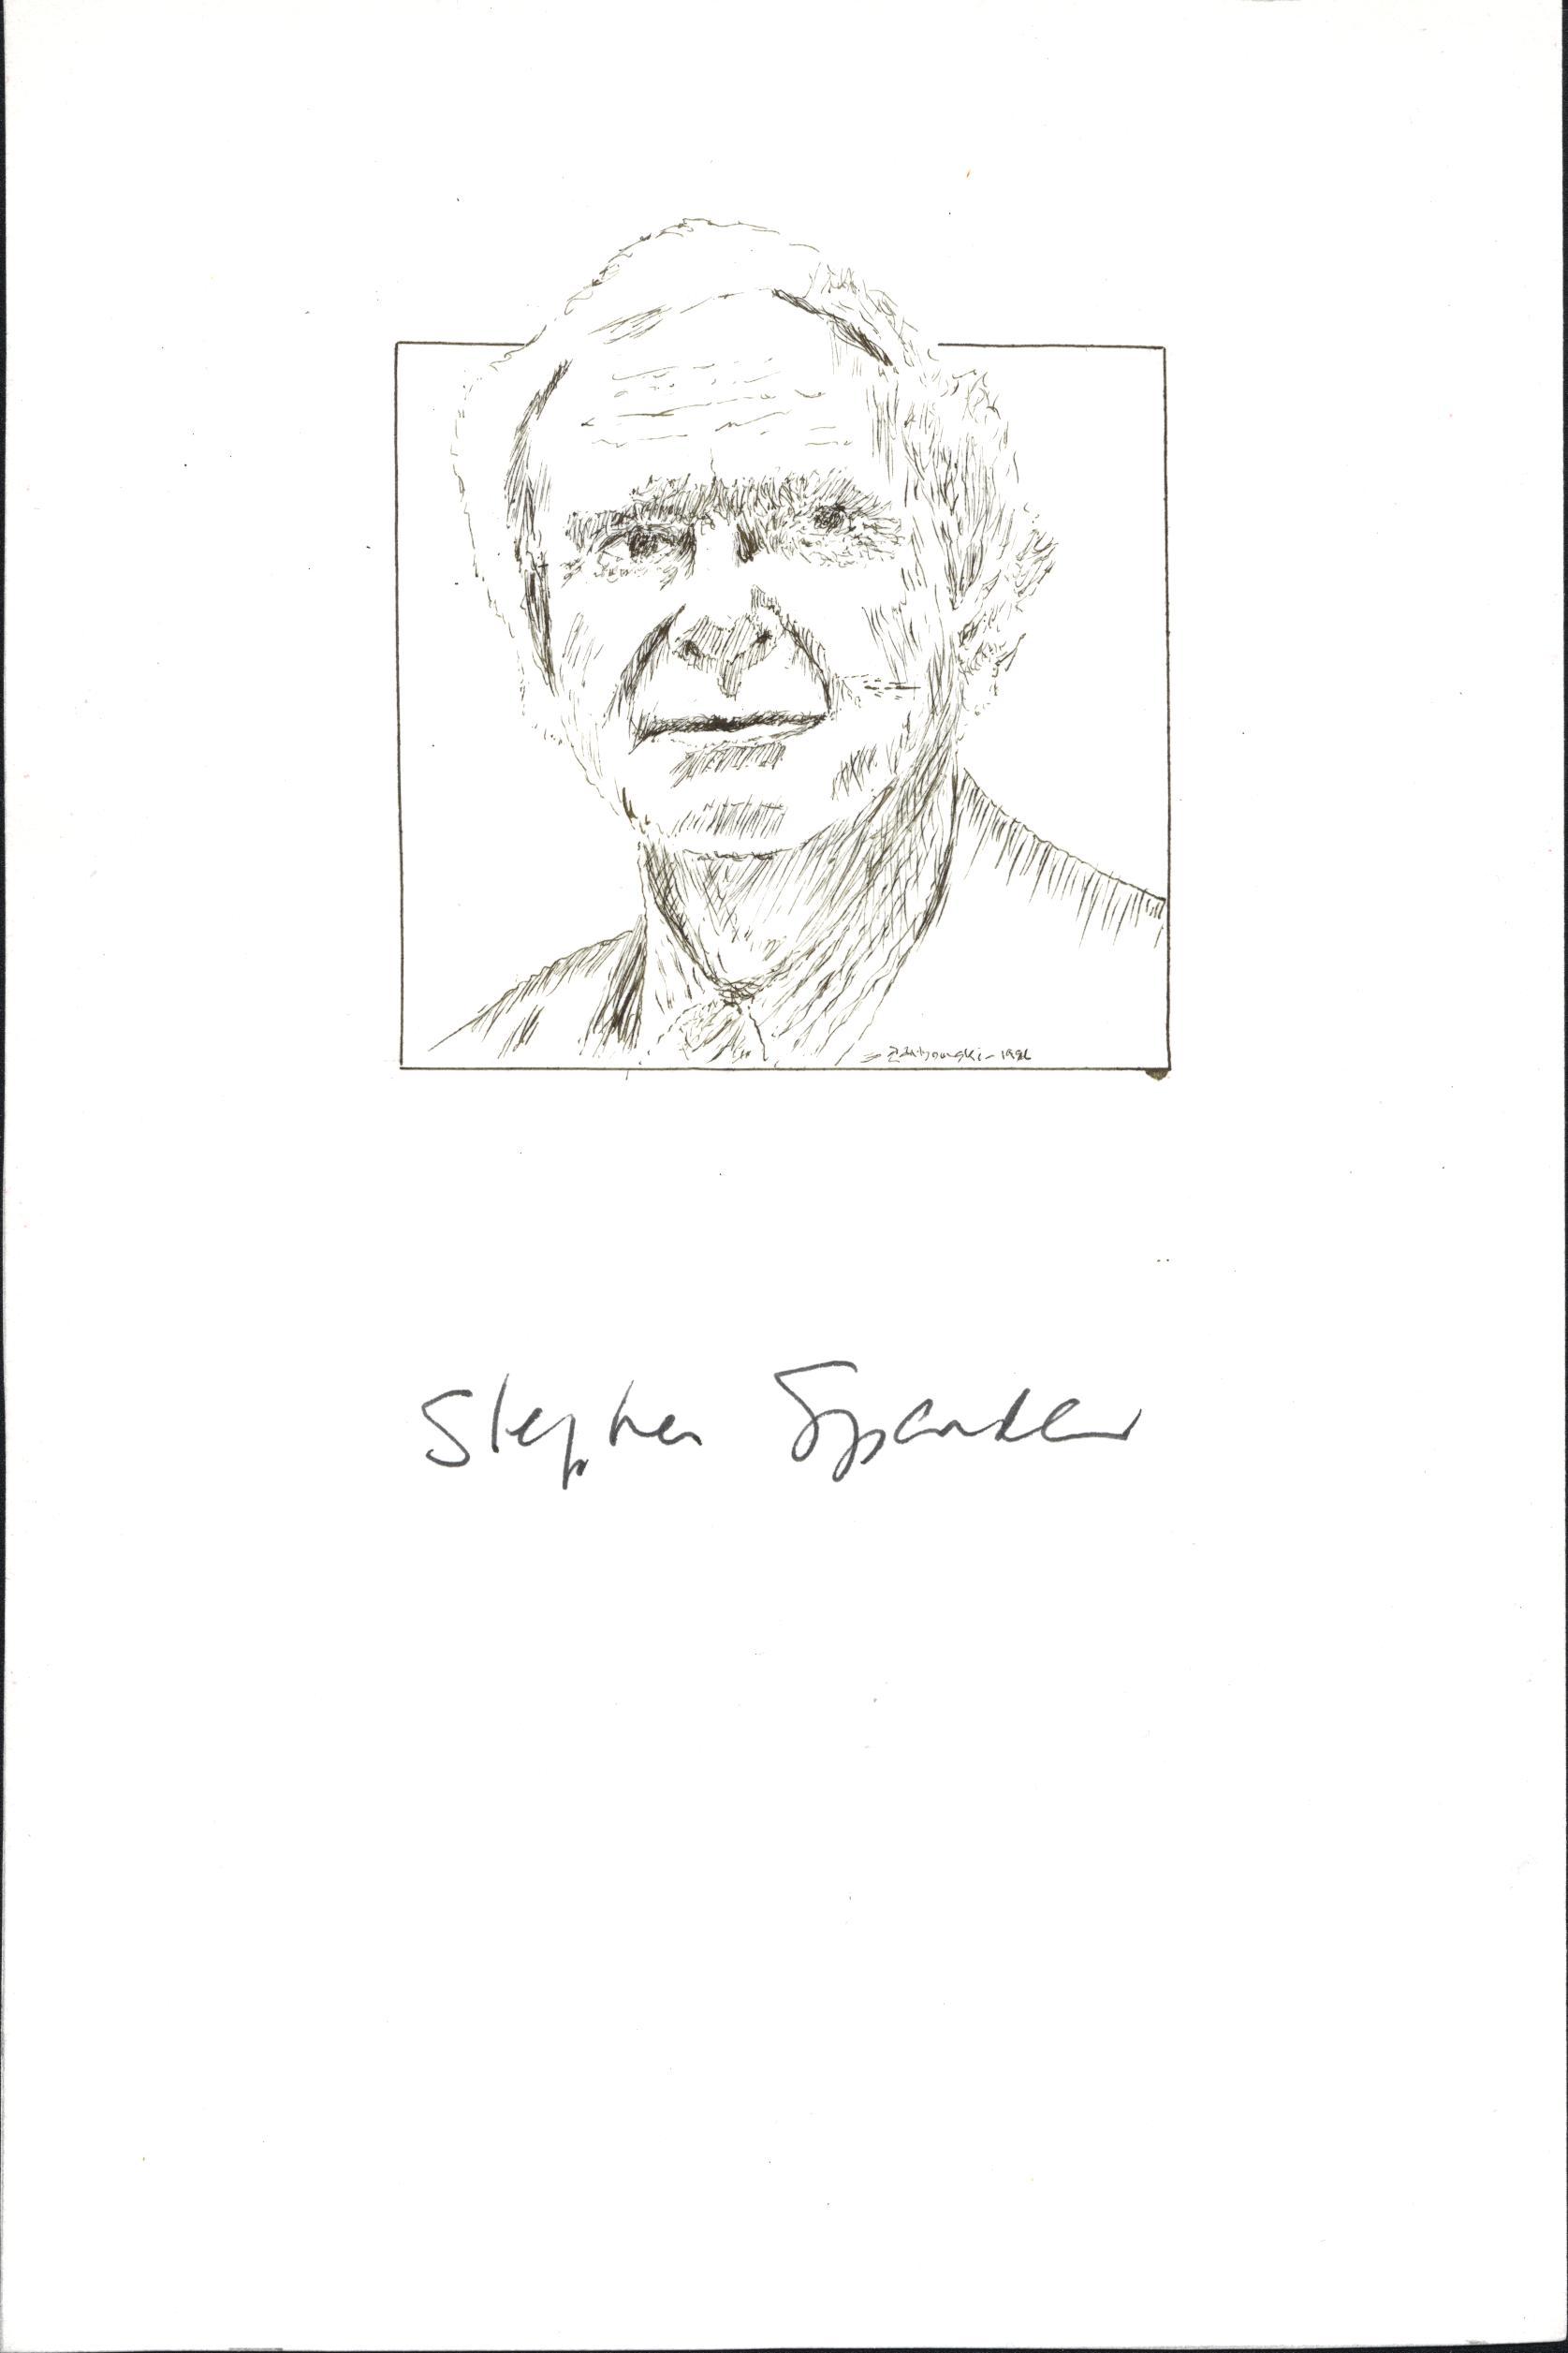 Stephen Spender Autograph